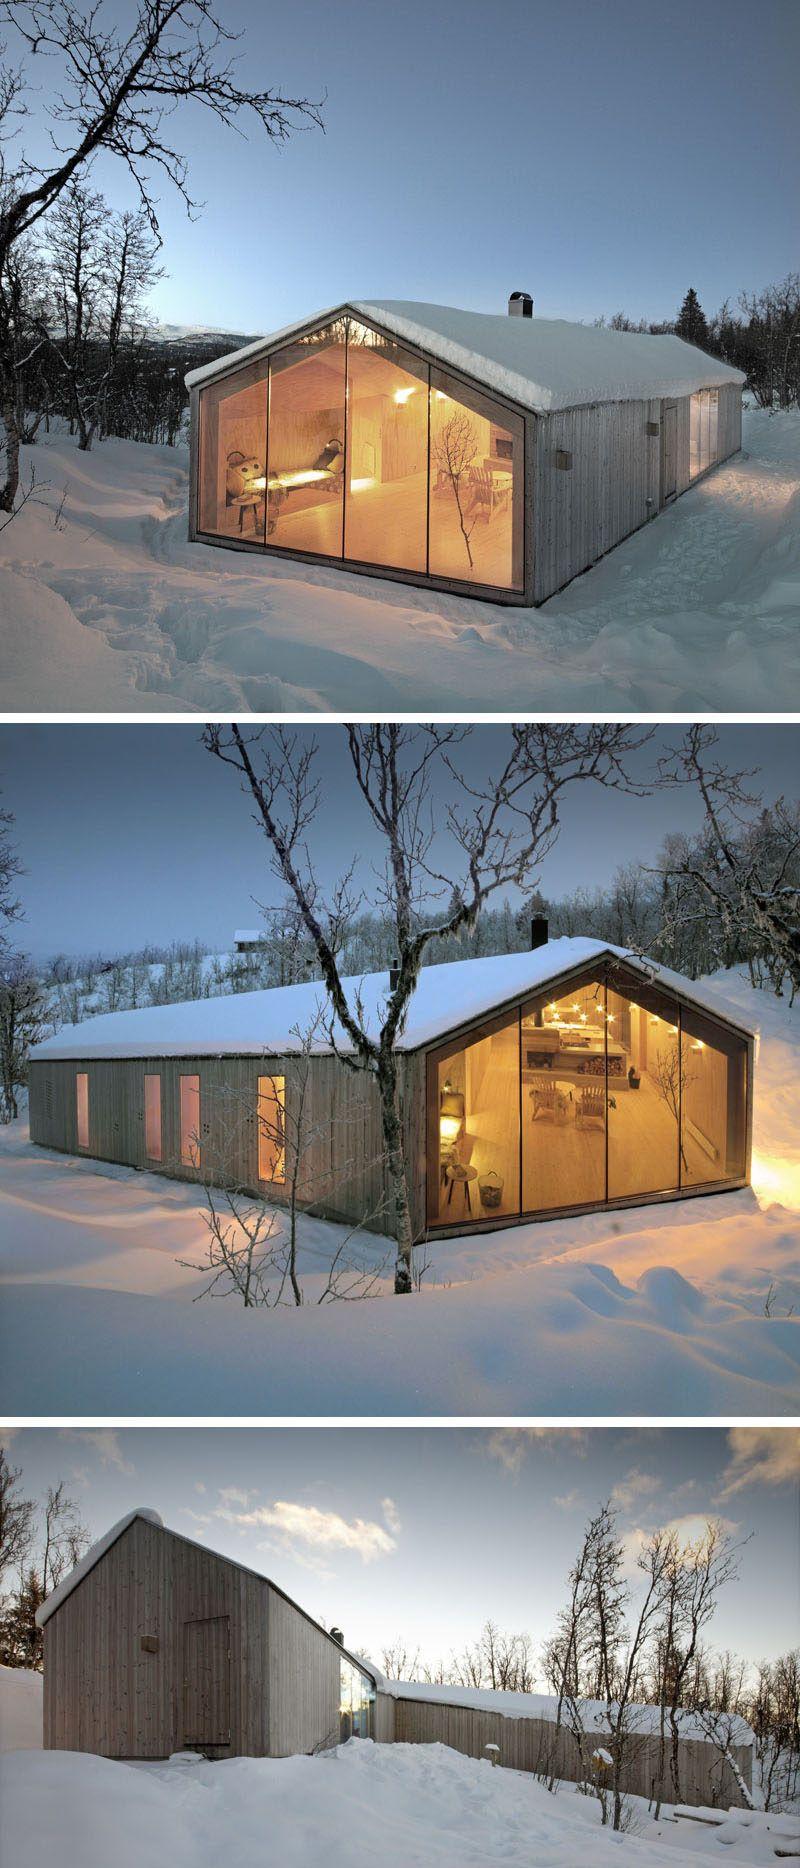 Reiulf Ramstad Arkitekter designed this contemporary cabin